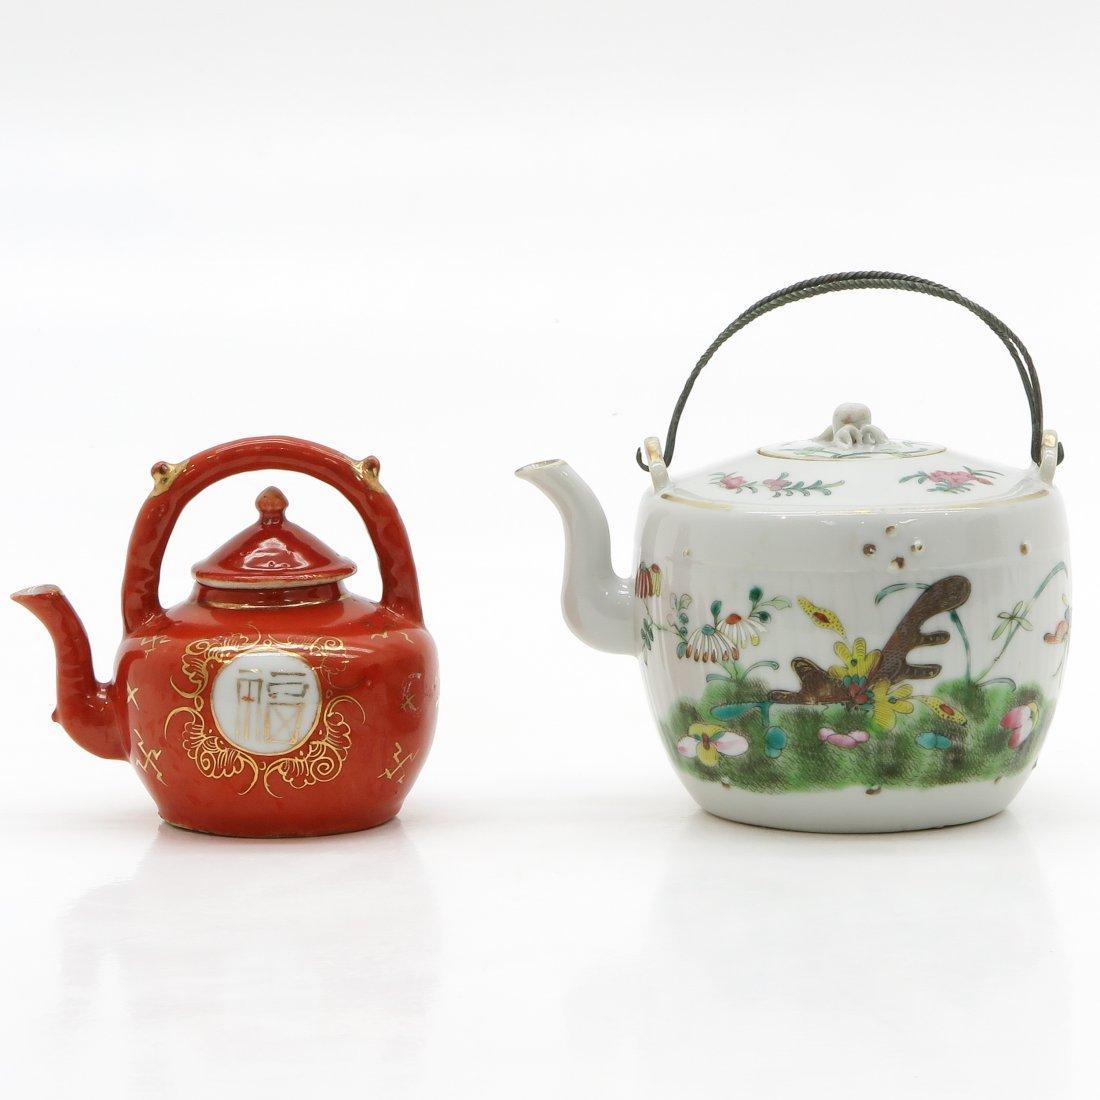 Lot of 2 China Porcelain Teapots